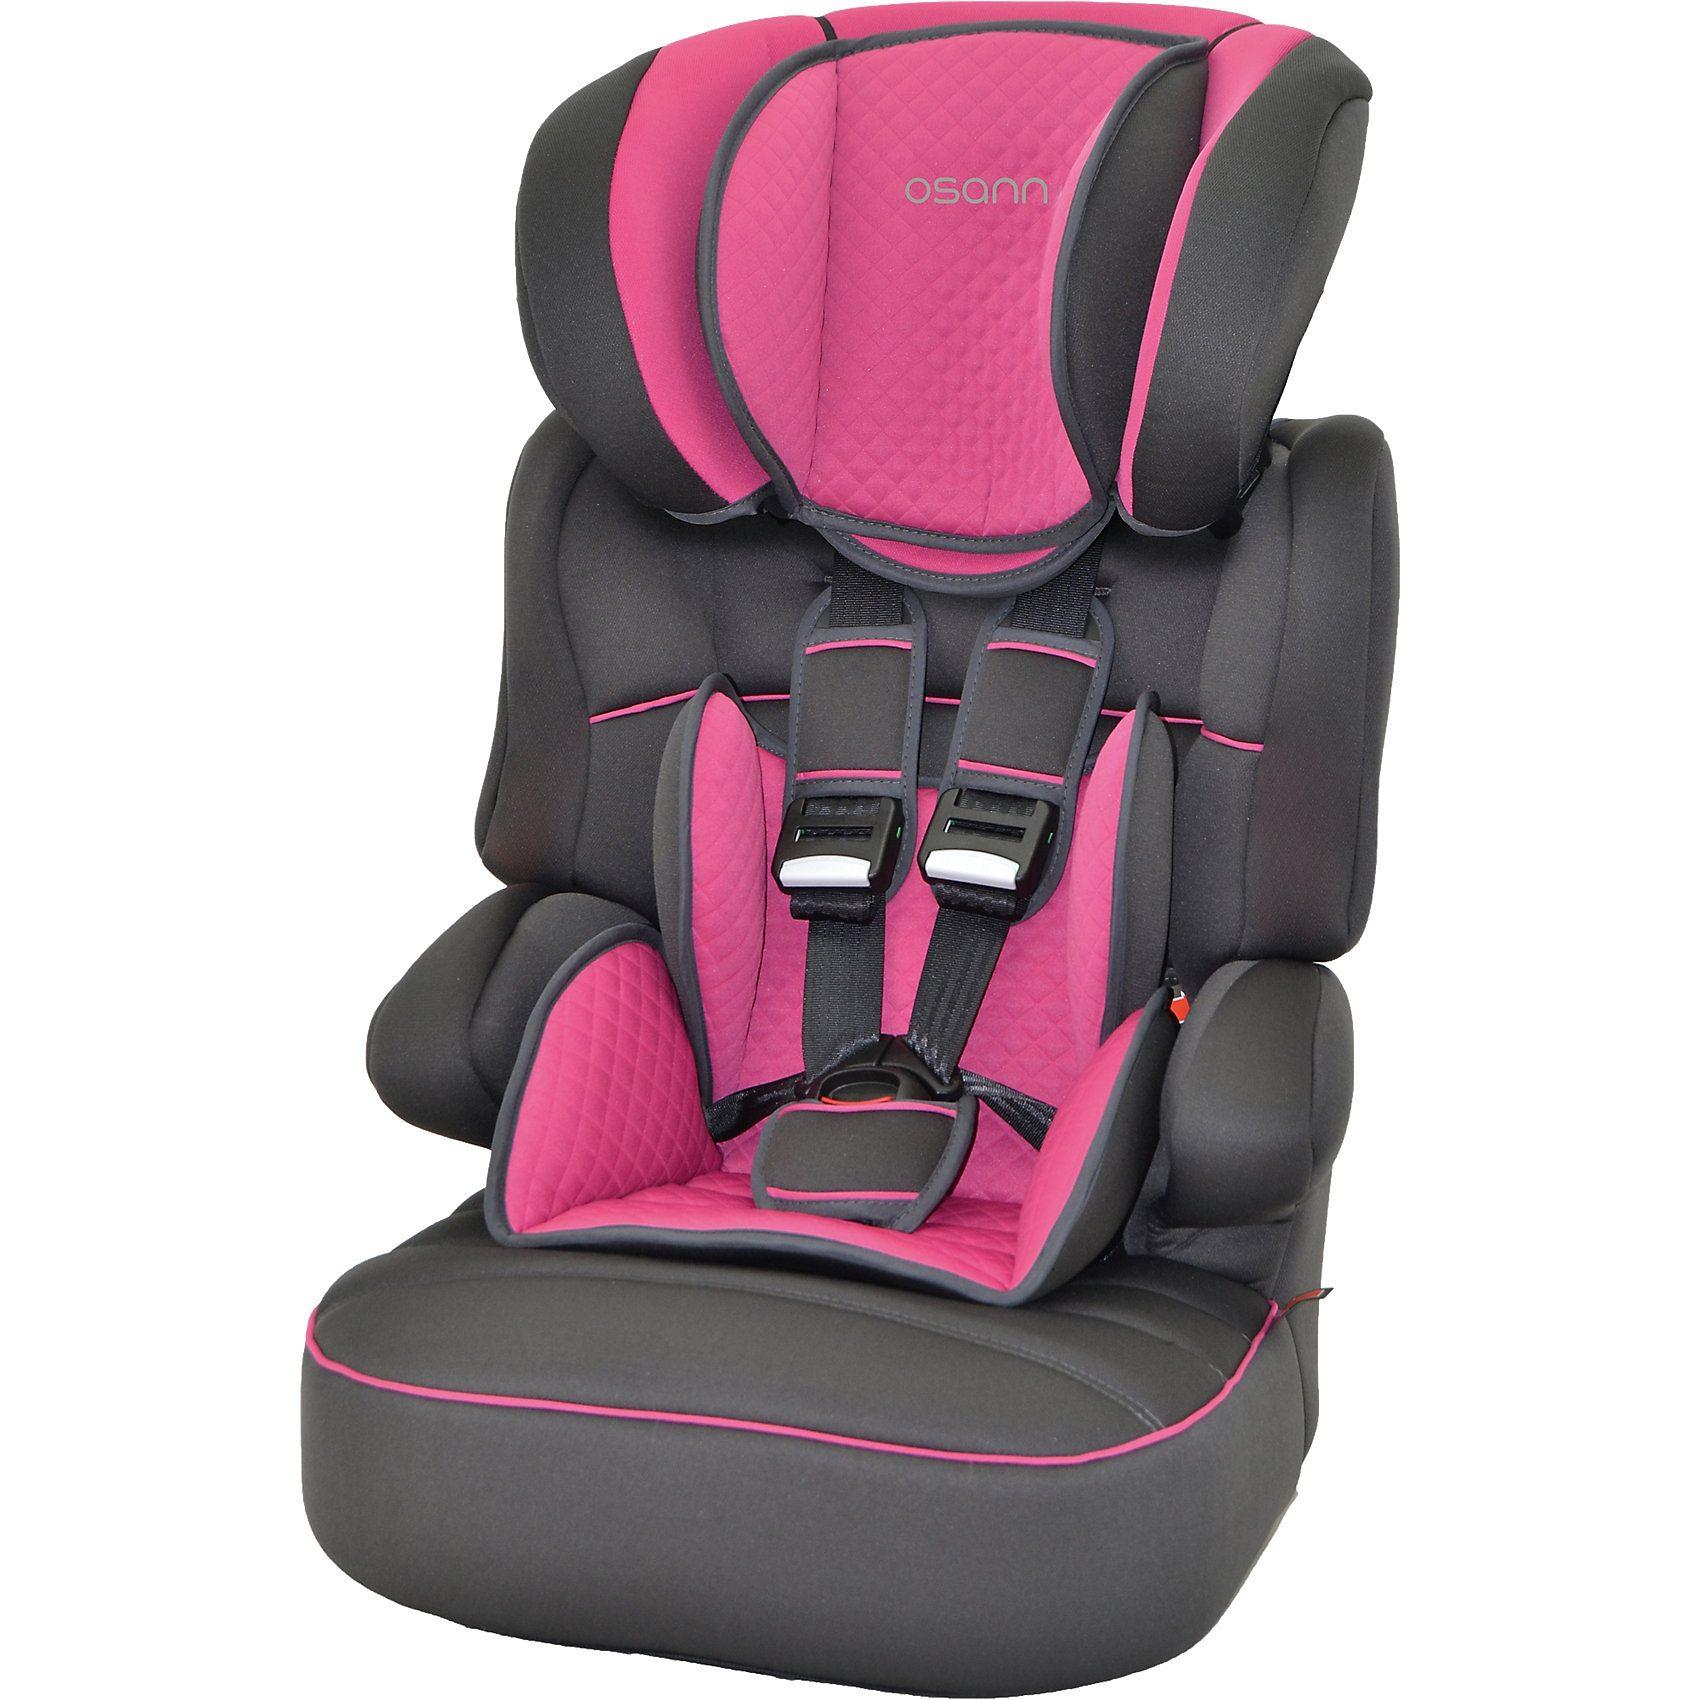 Osann Auto-Kindersitz Colorado, Quilt Framboise, 2017